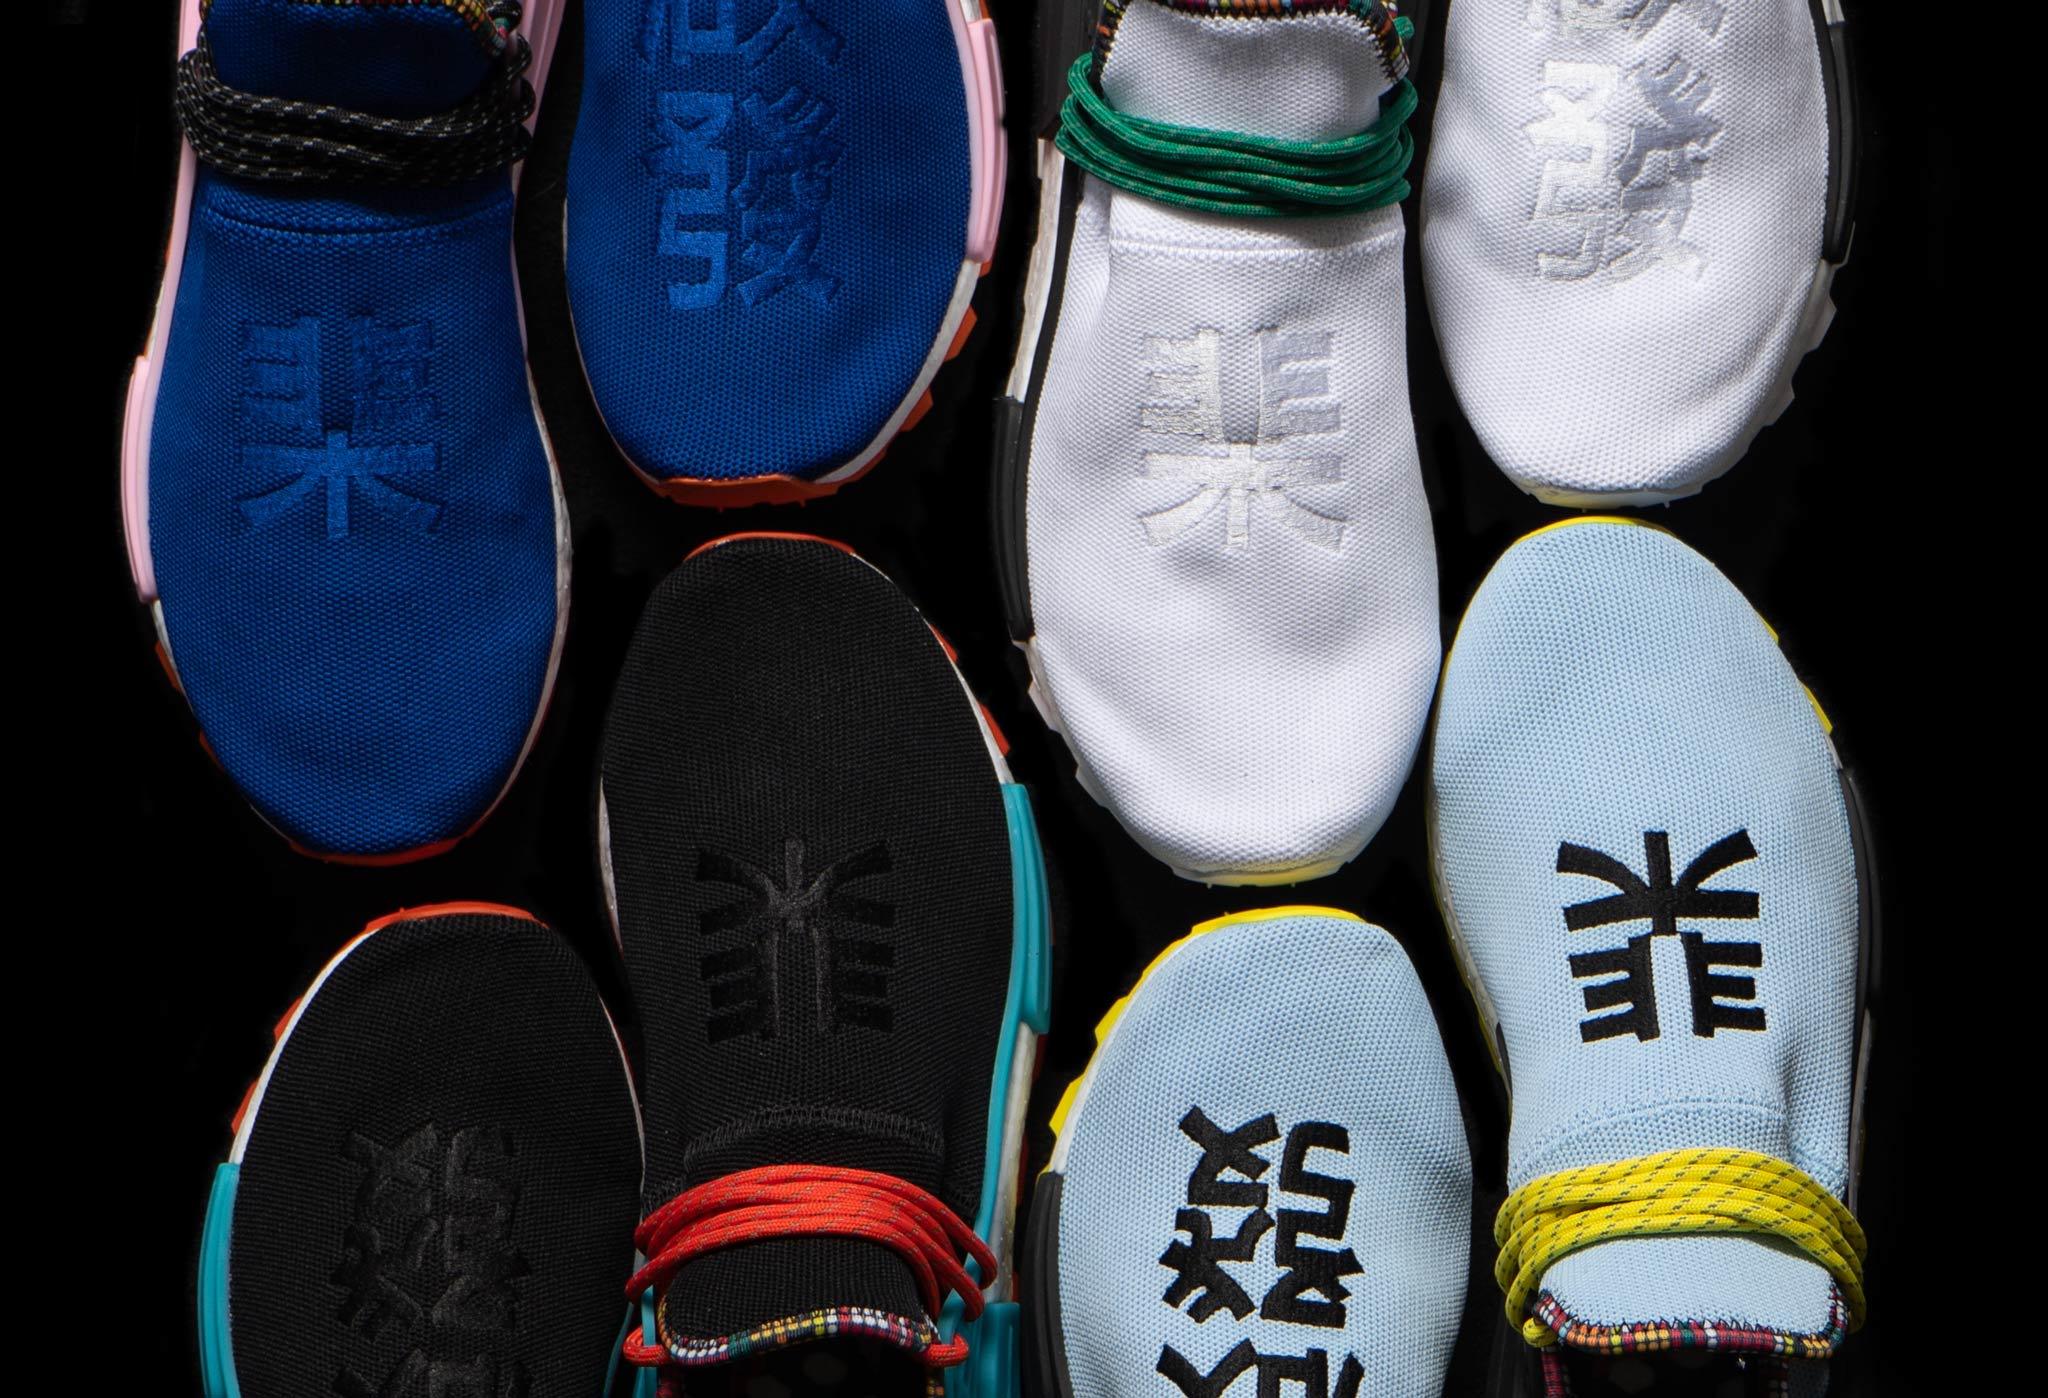 31deee642cc HAVEN-adidas-x-Pharrell-Williams-Solar-HU-NMD-News-WEB-1- telxfj.jpg